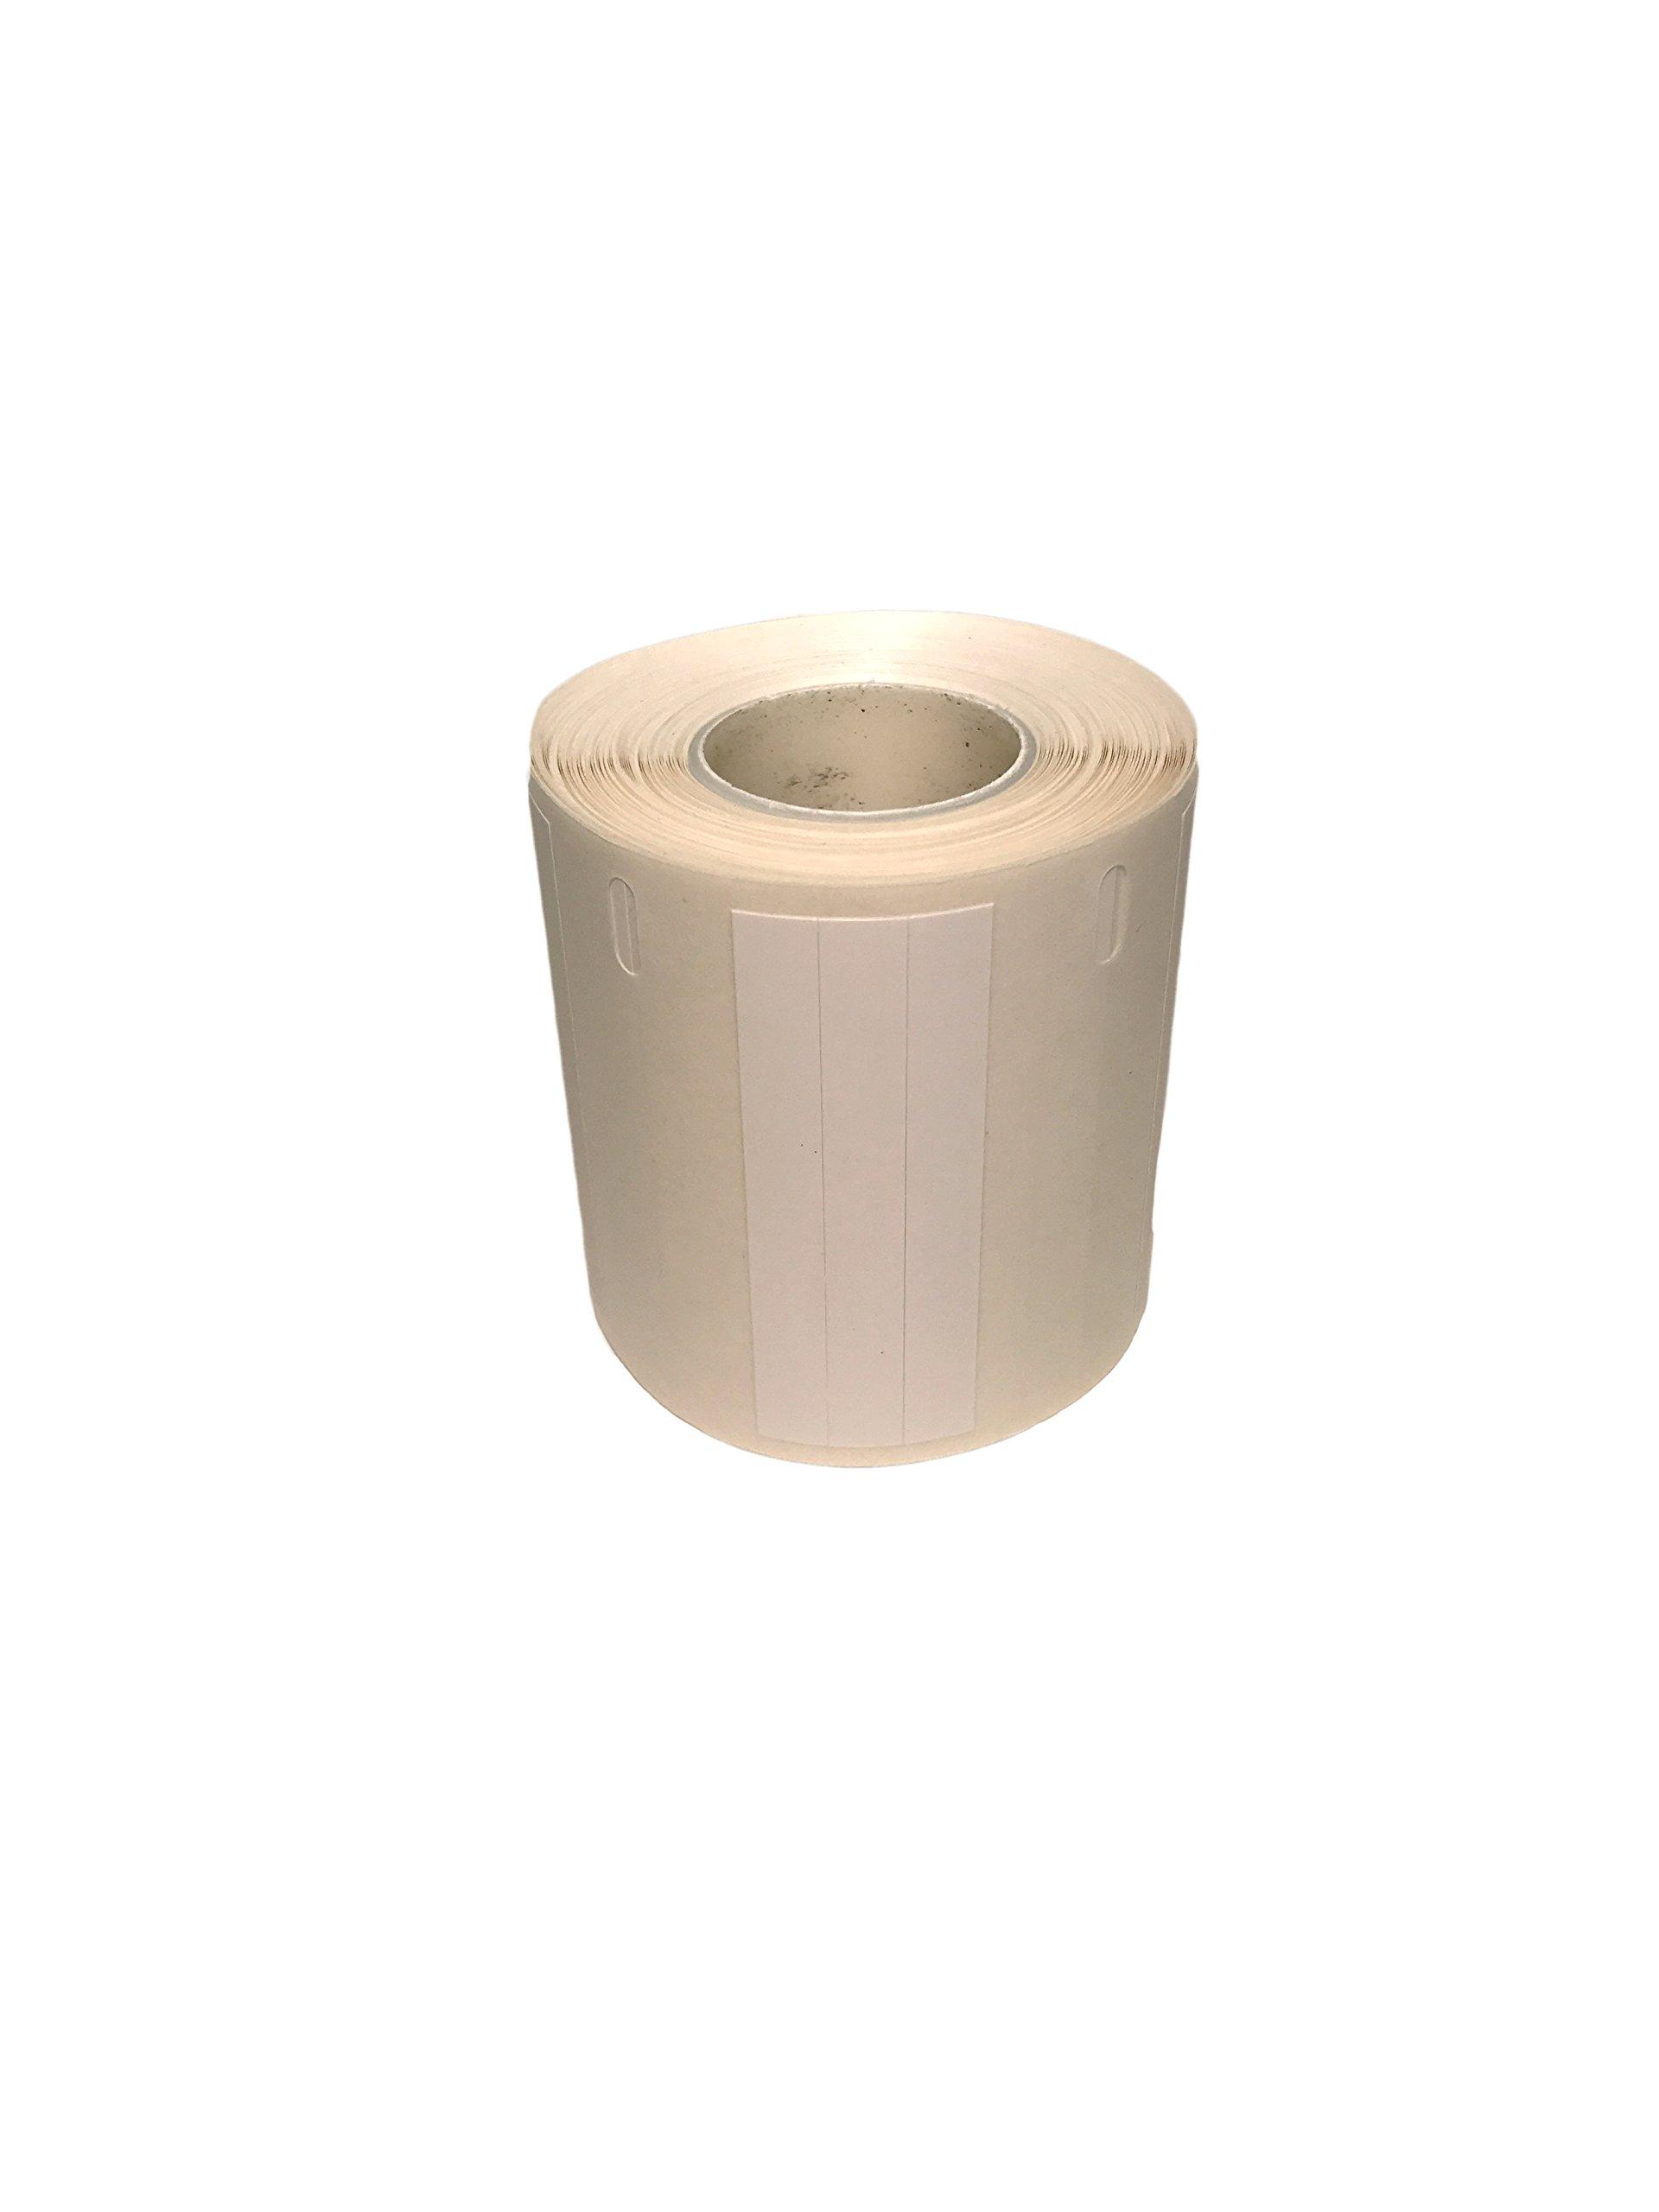 Cryo-Tag Direct Thermal Labels 9.5 mm dia, White, 0.5 ml tubes, 4000/PK